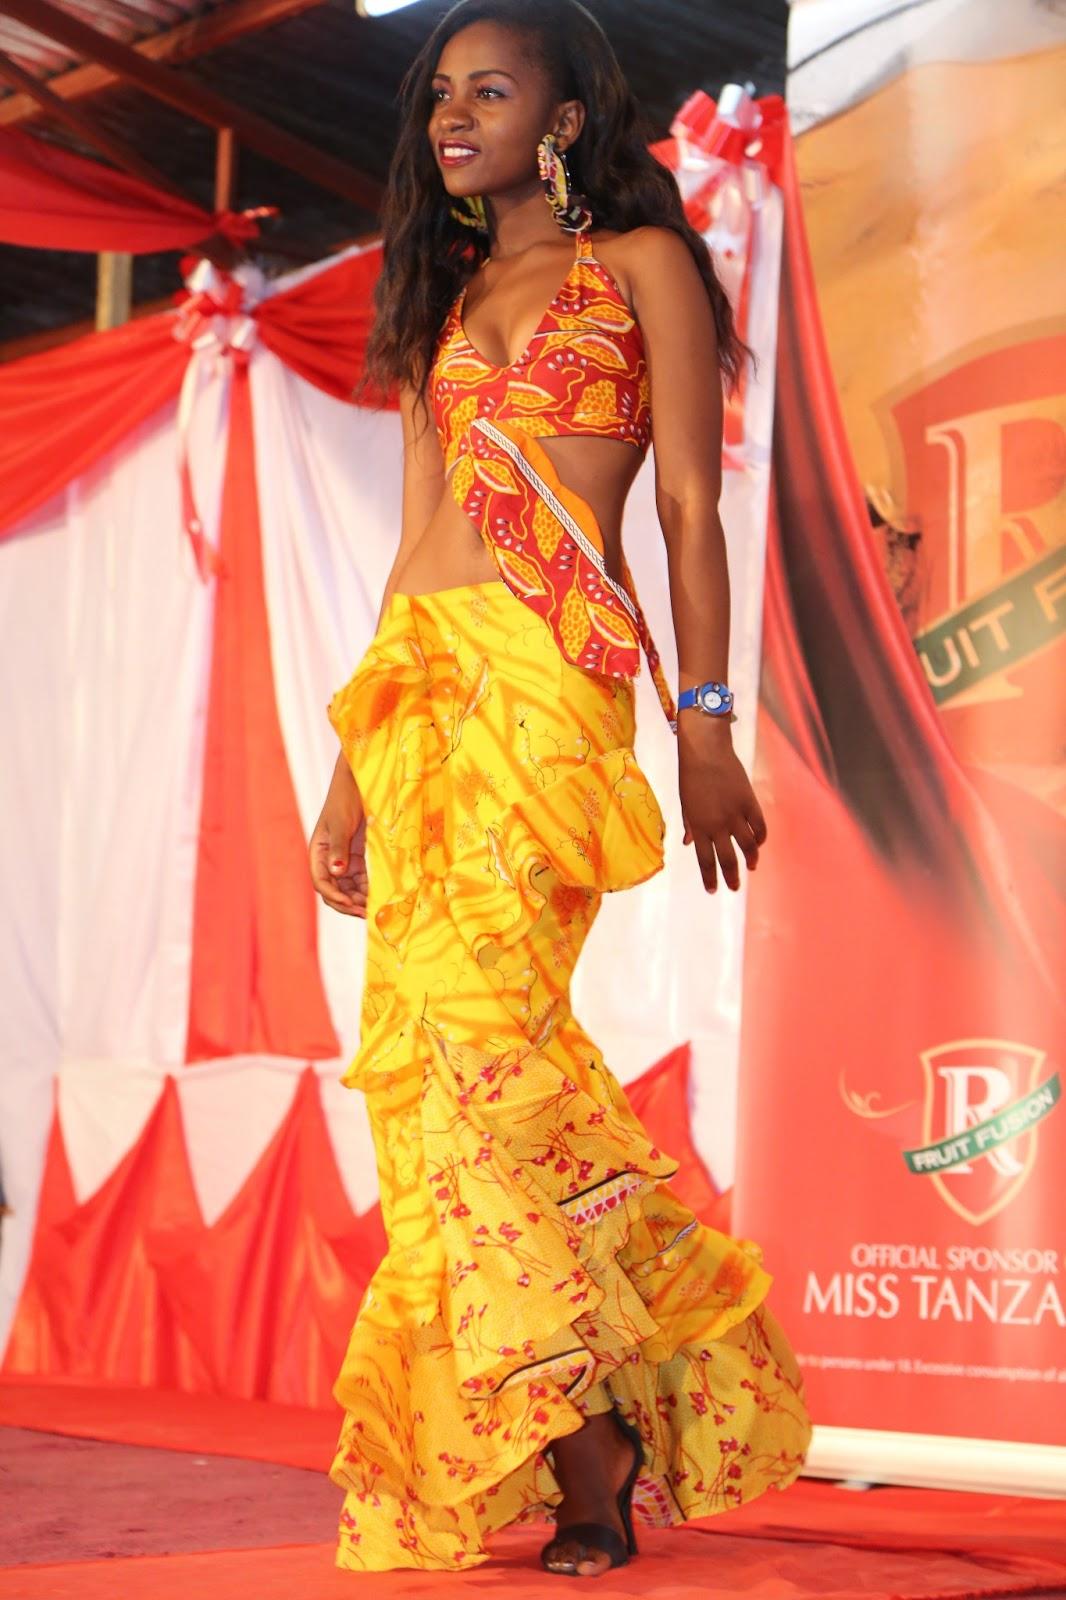 TASWIRA MBALIMBALI KATIKA KINYANG'ANYIRO CHA MISS TABORA 2013